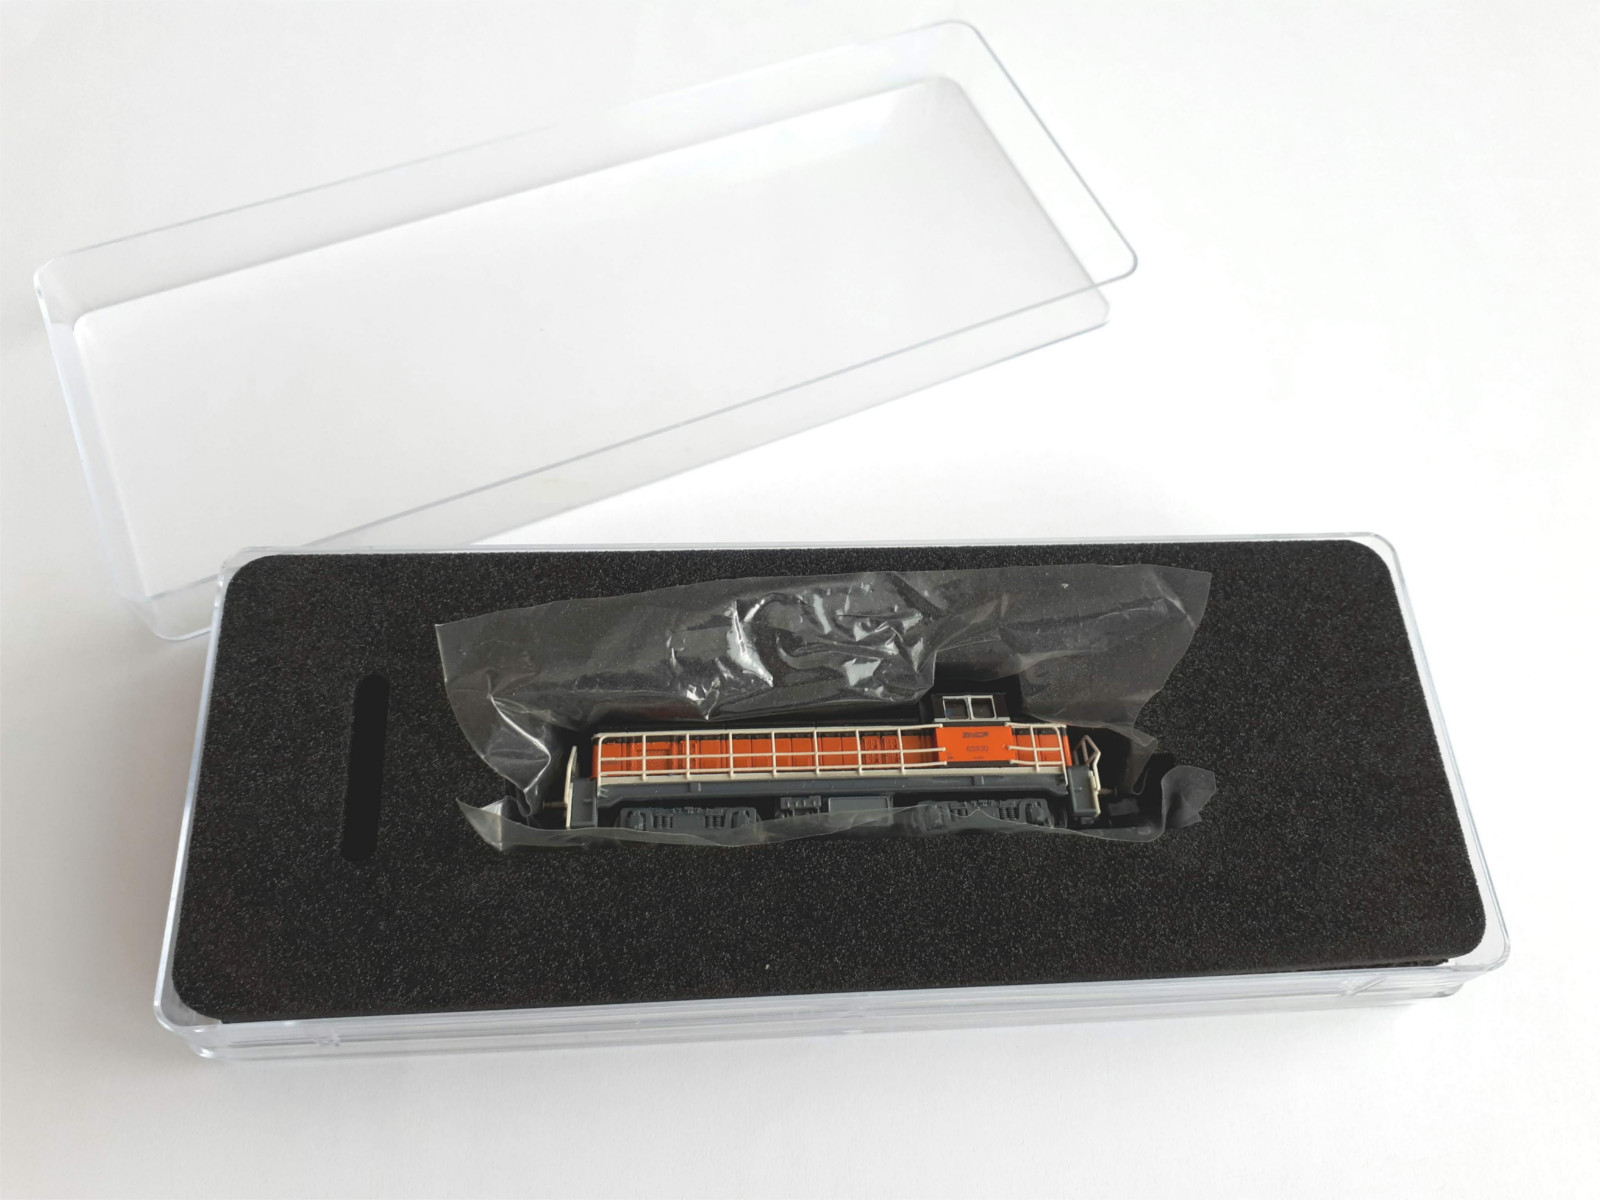 HFR-090.B2